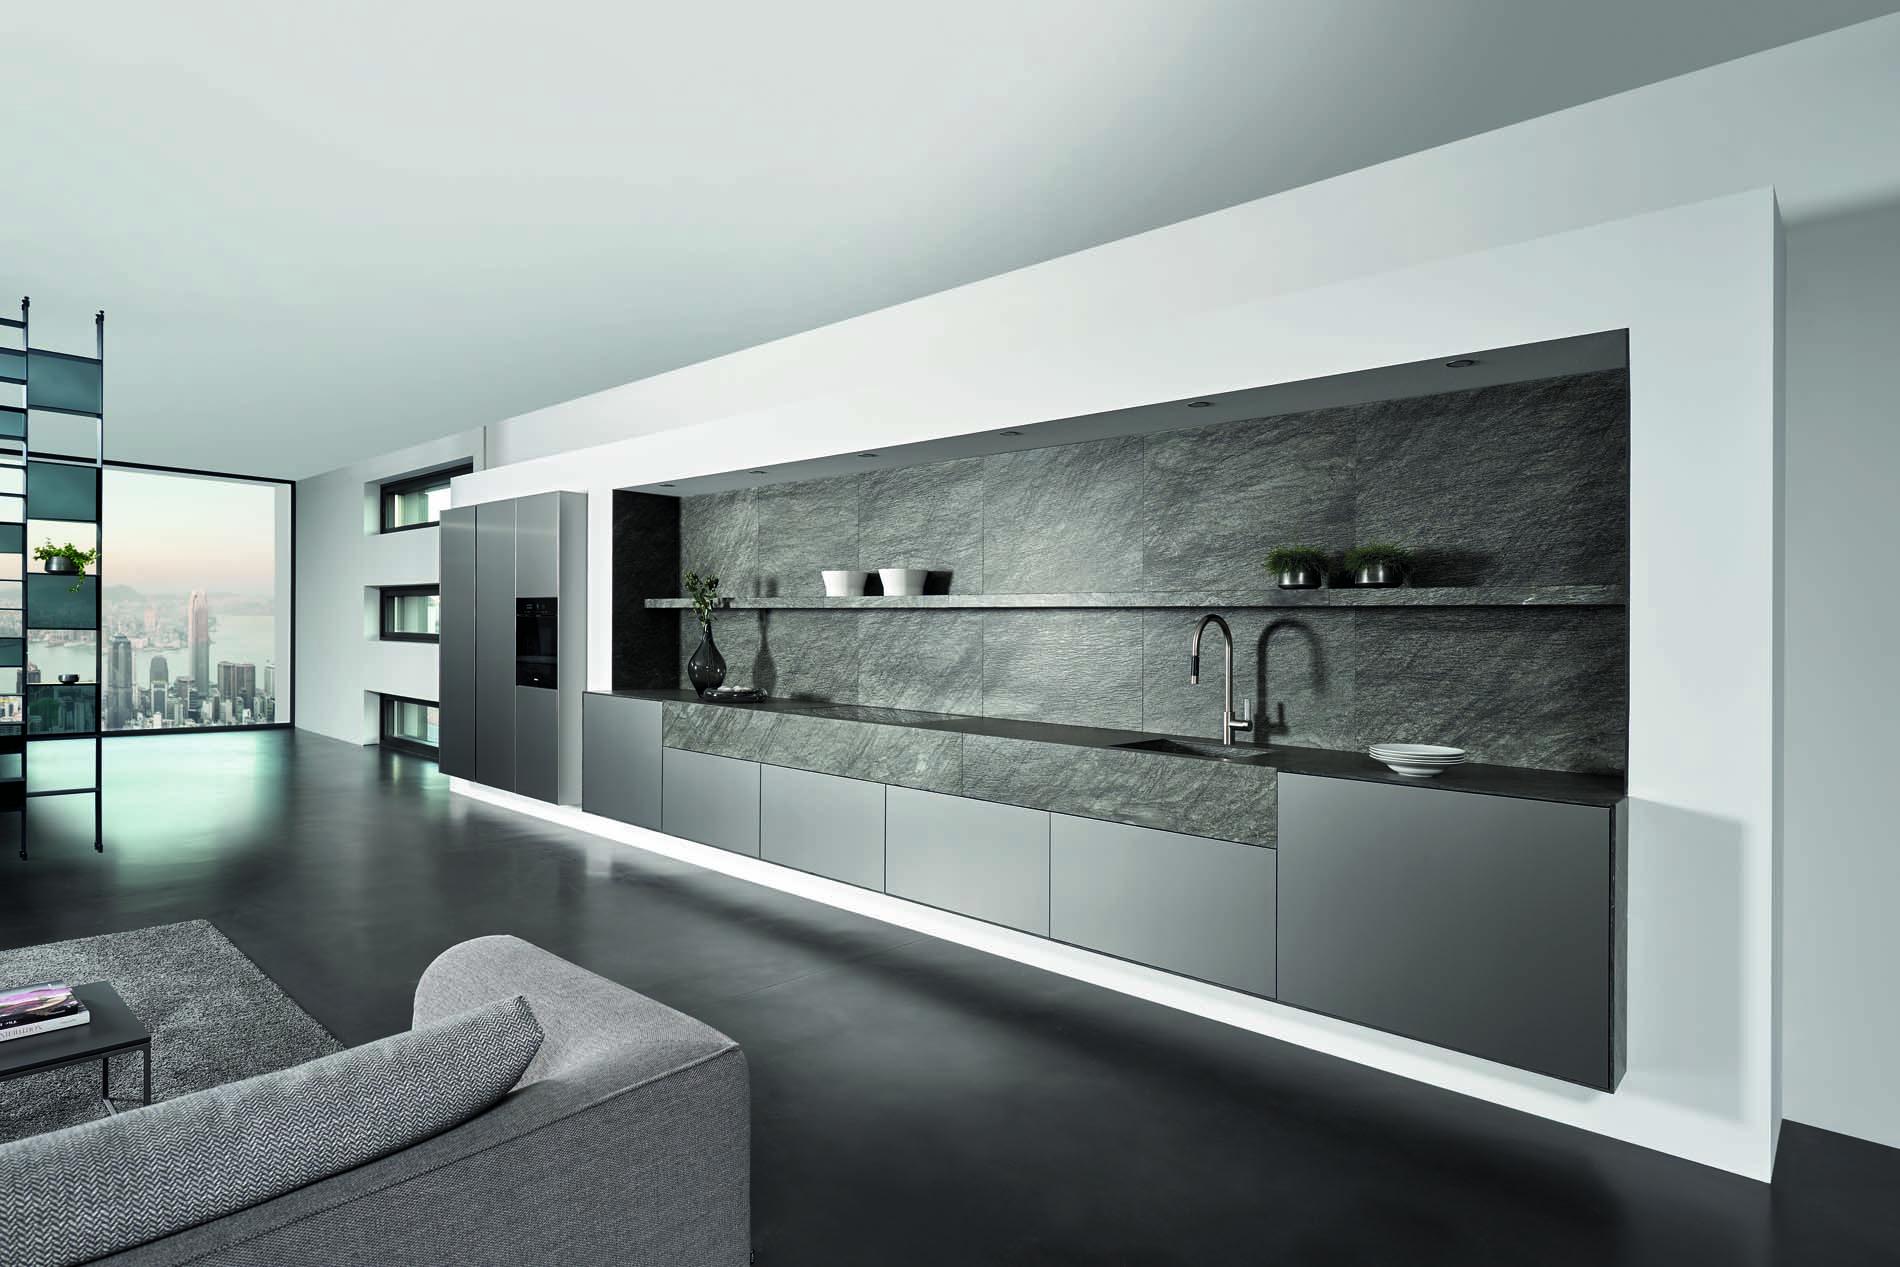 Industriele keuken outlet u2013 informatie over de keuken